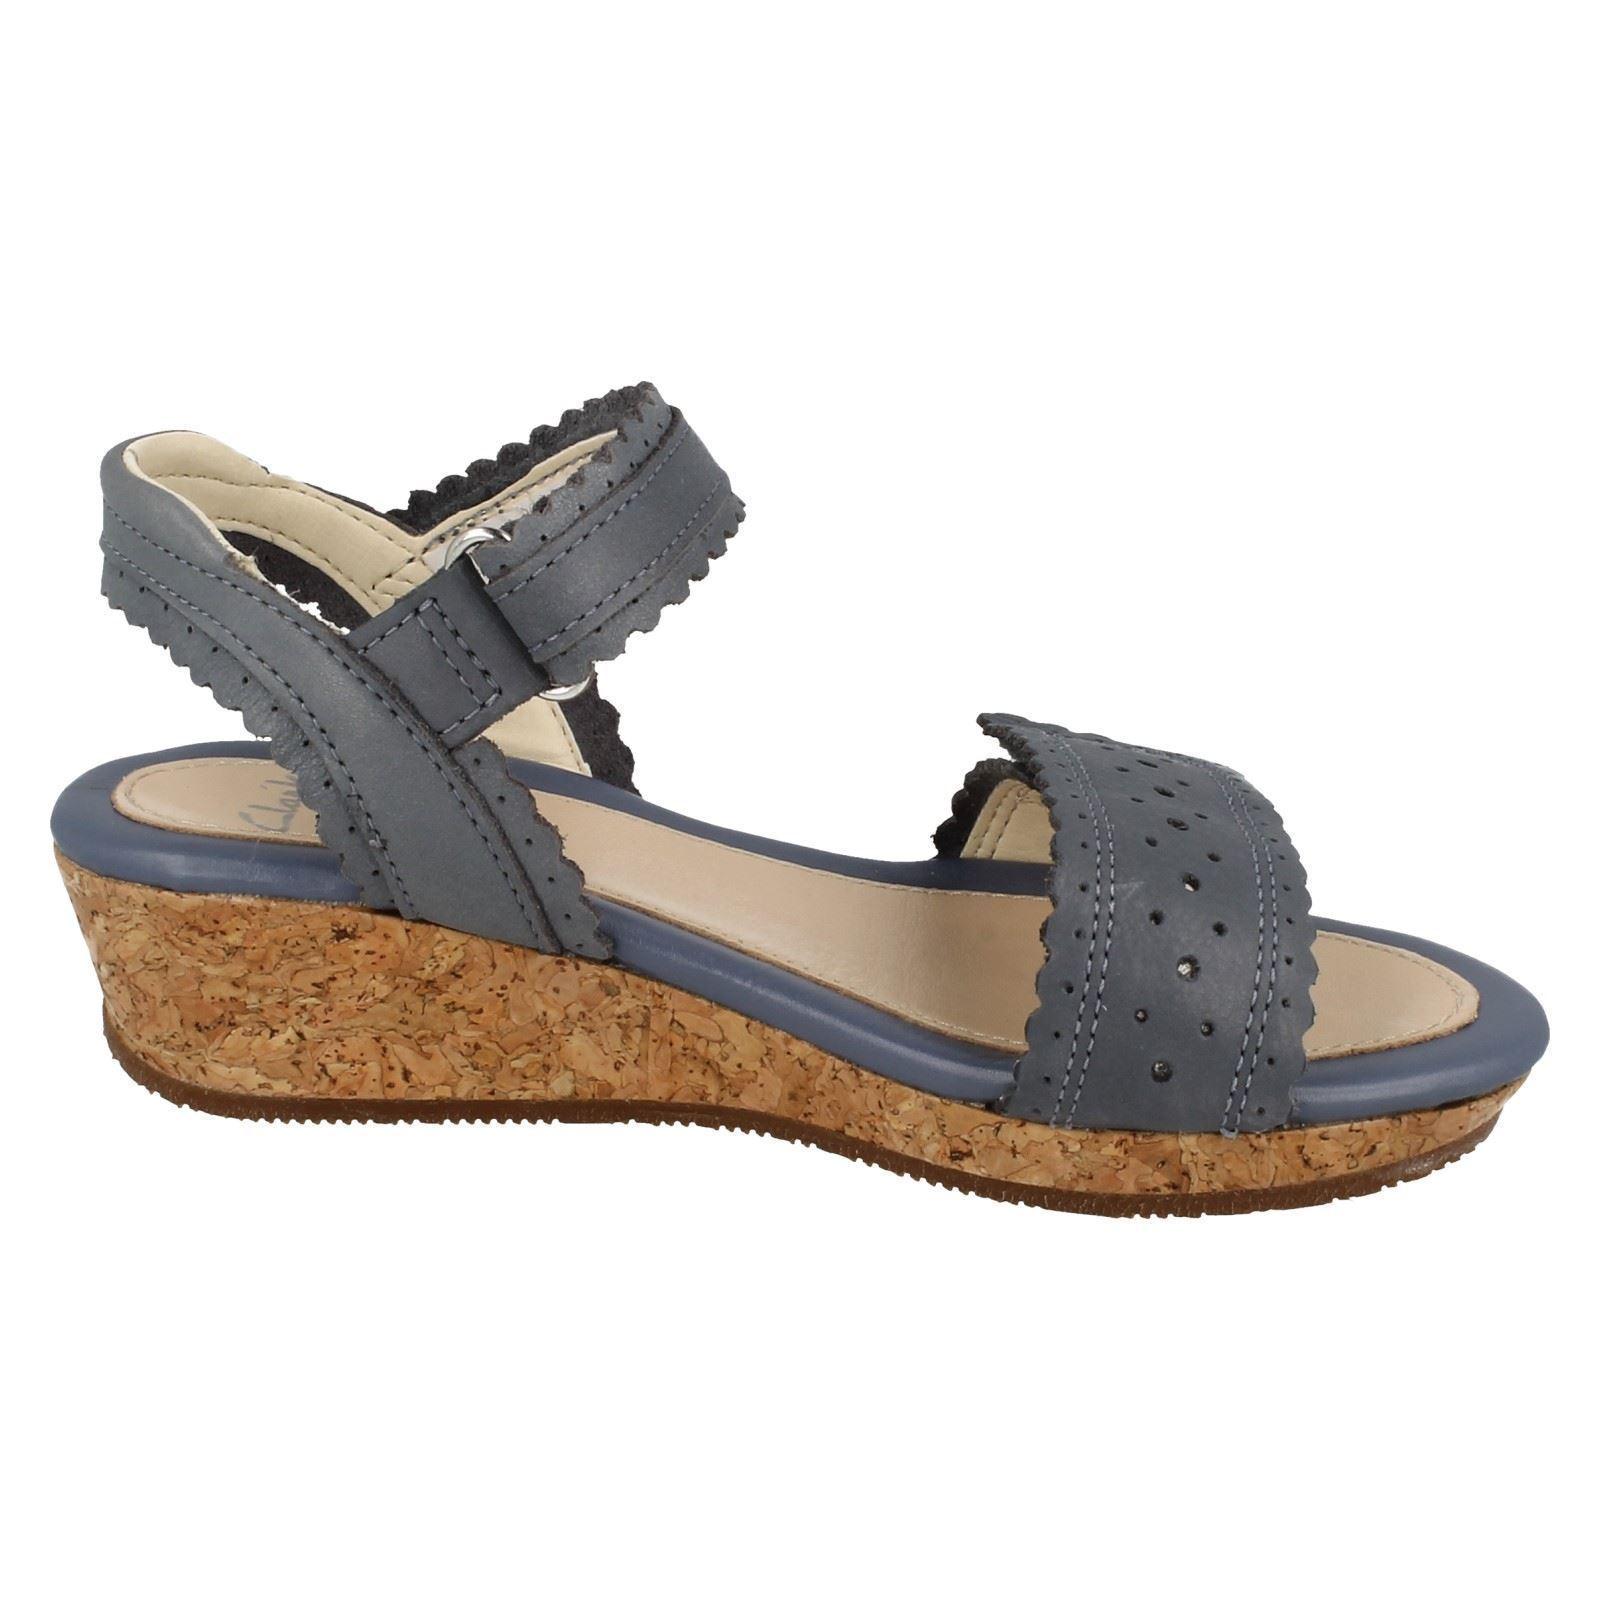 Girls Clarks Sandals Style - Harpy Myth